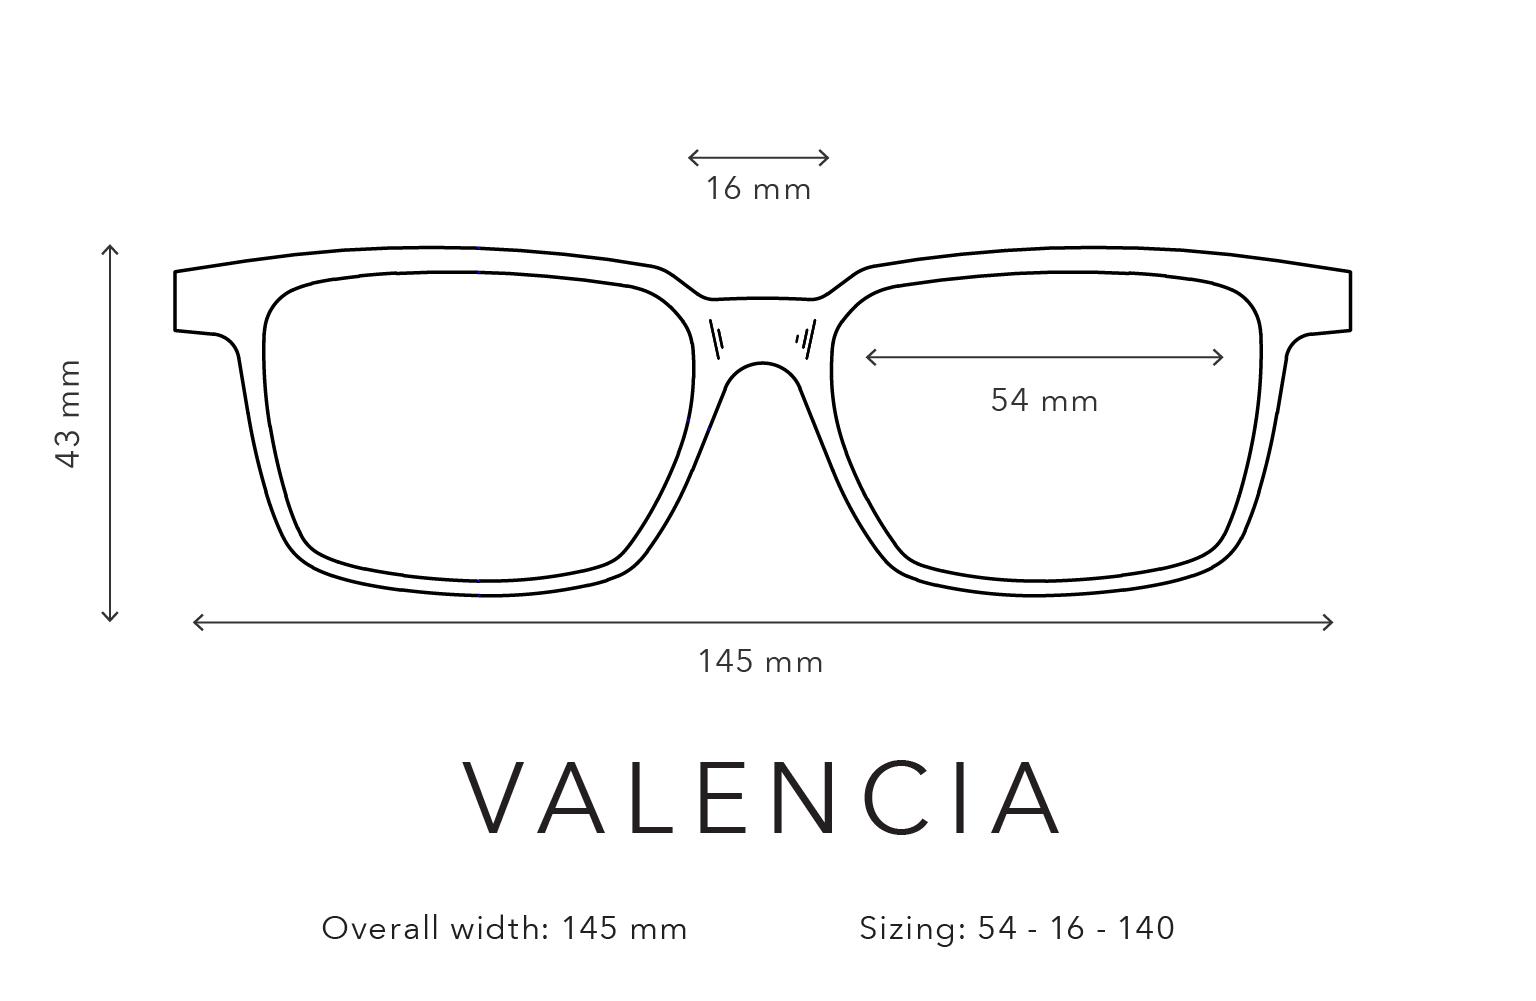 Valencia Frame Sizing